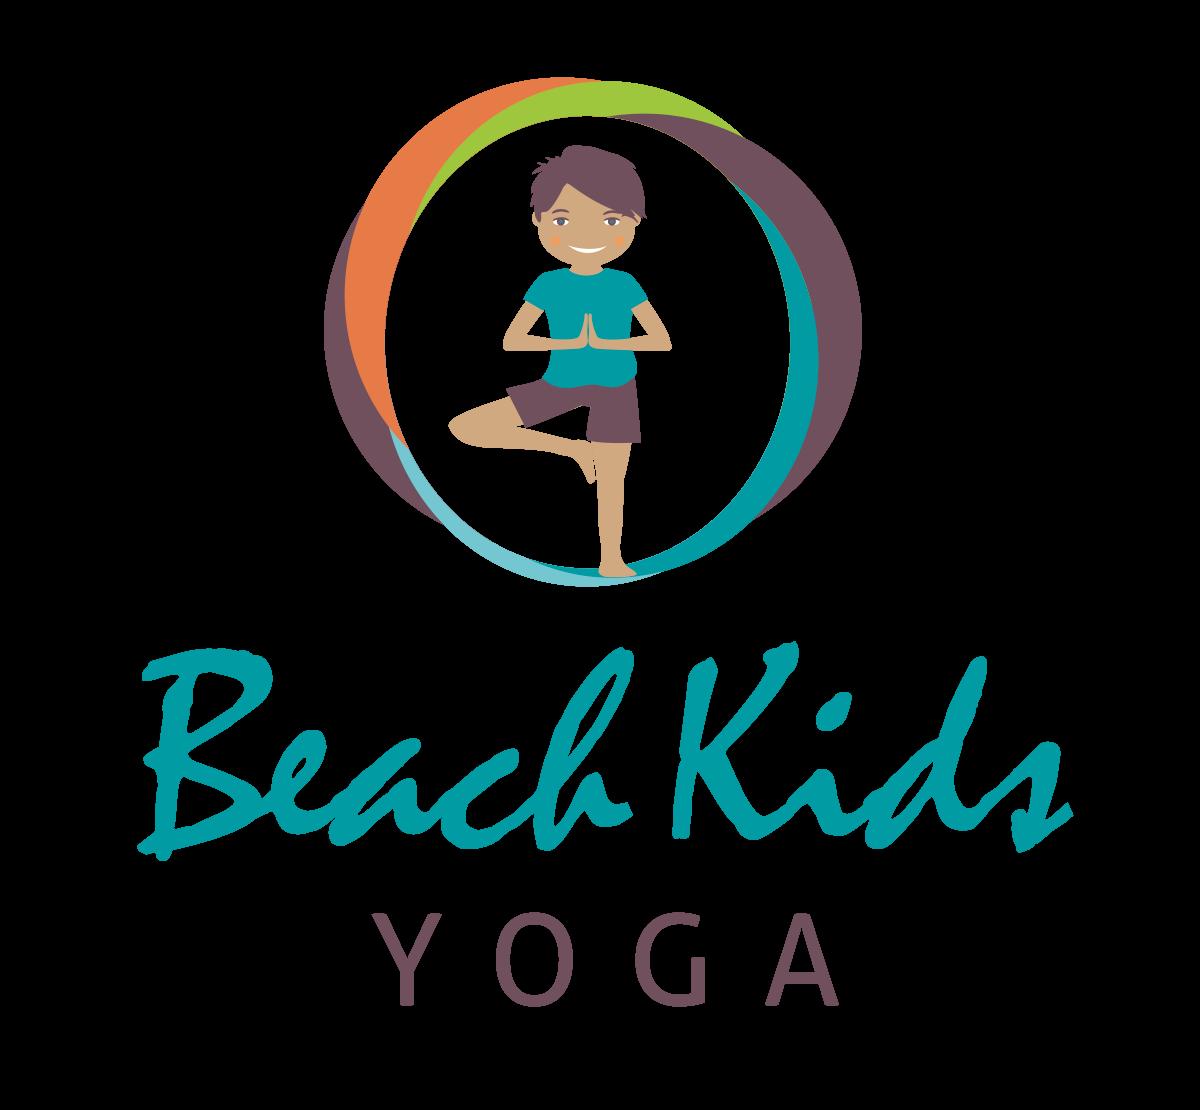 Beach Kids Yoga Logo Design